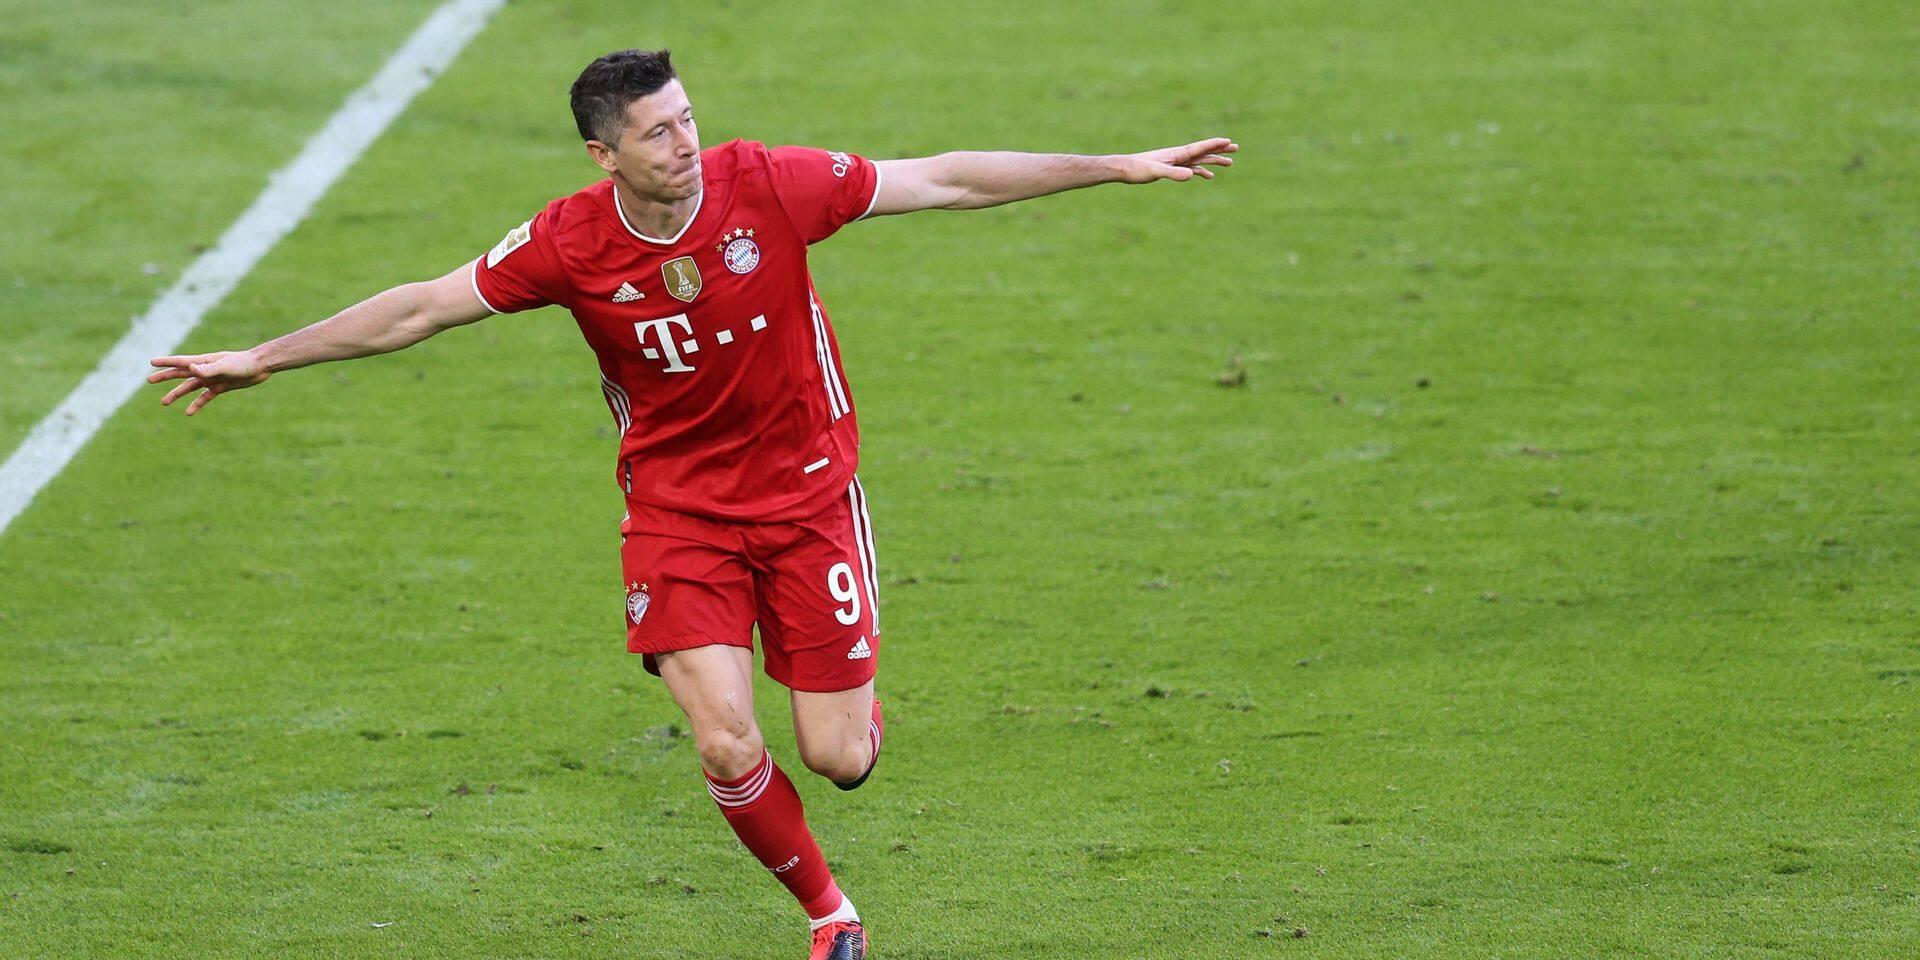 GES / Soccer / FC Bayern Munich - Borussia Monchengladbach, May 8th, 2021